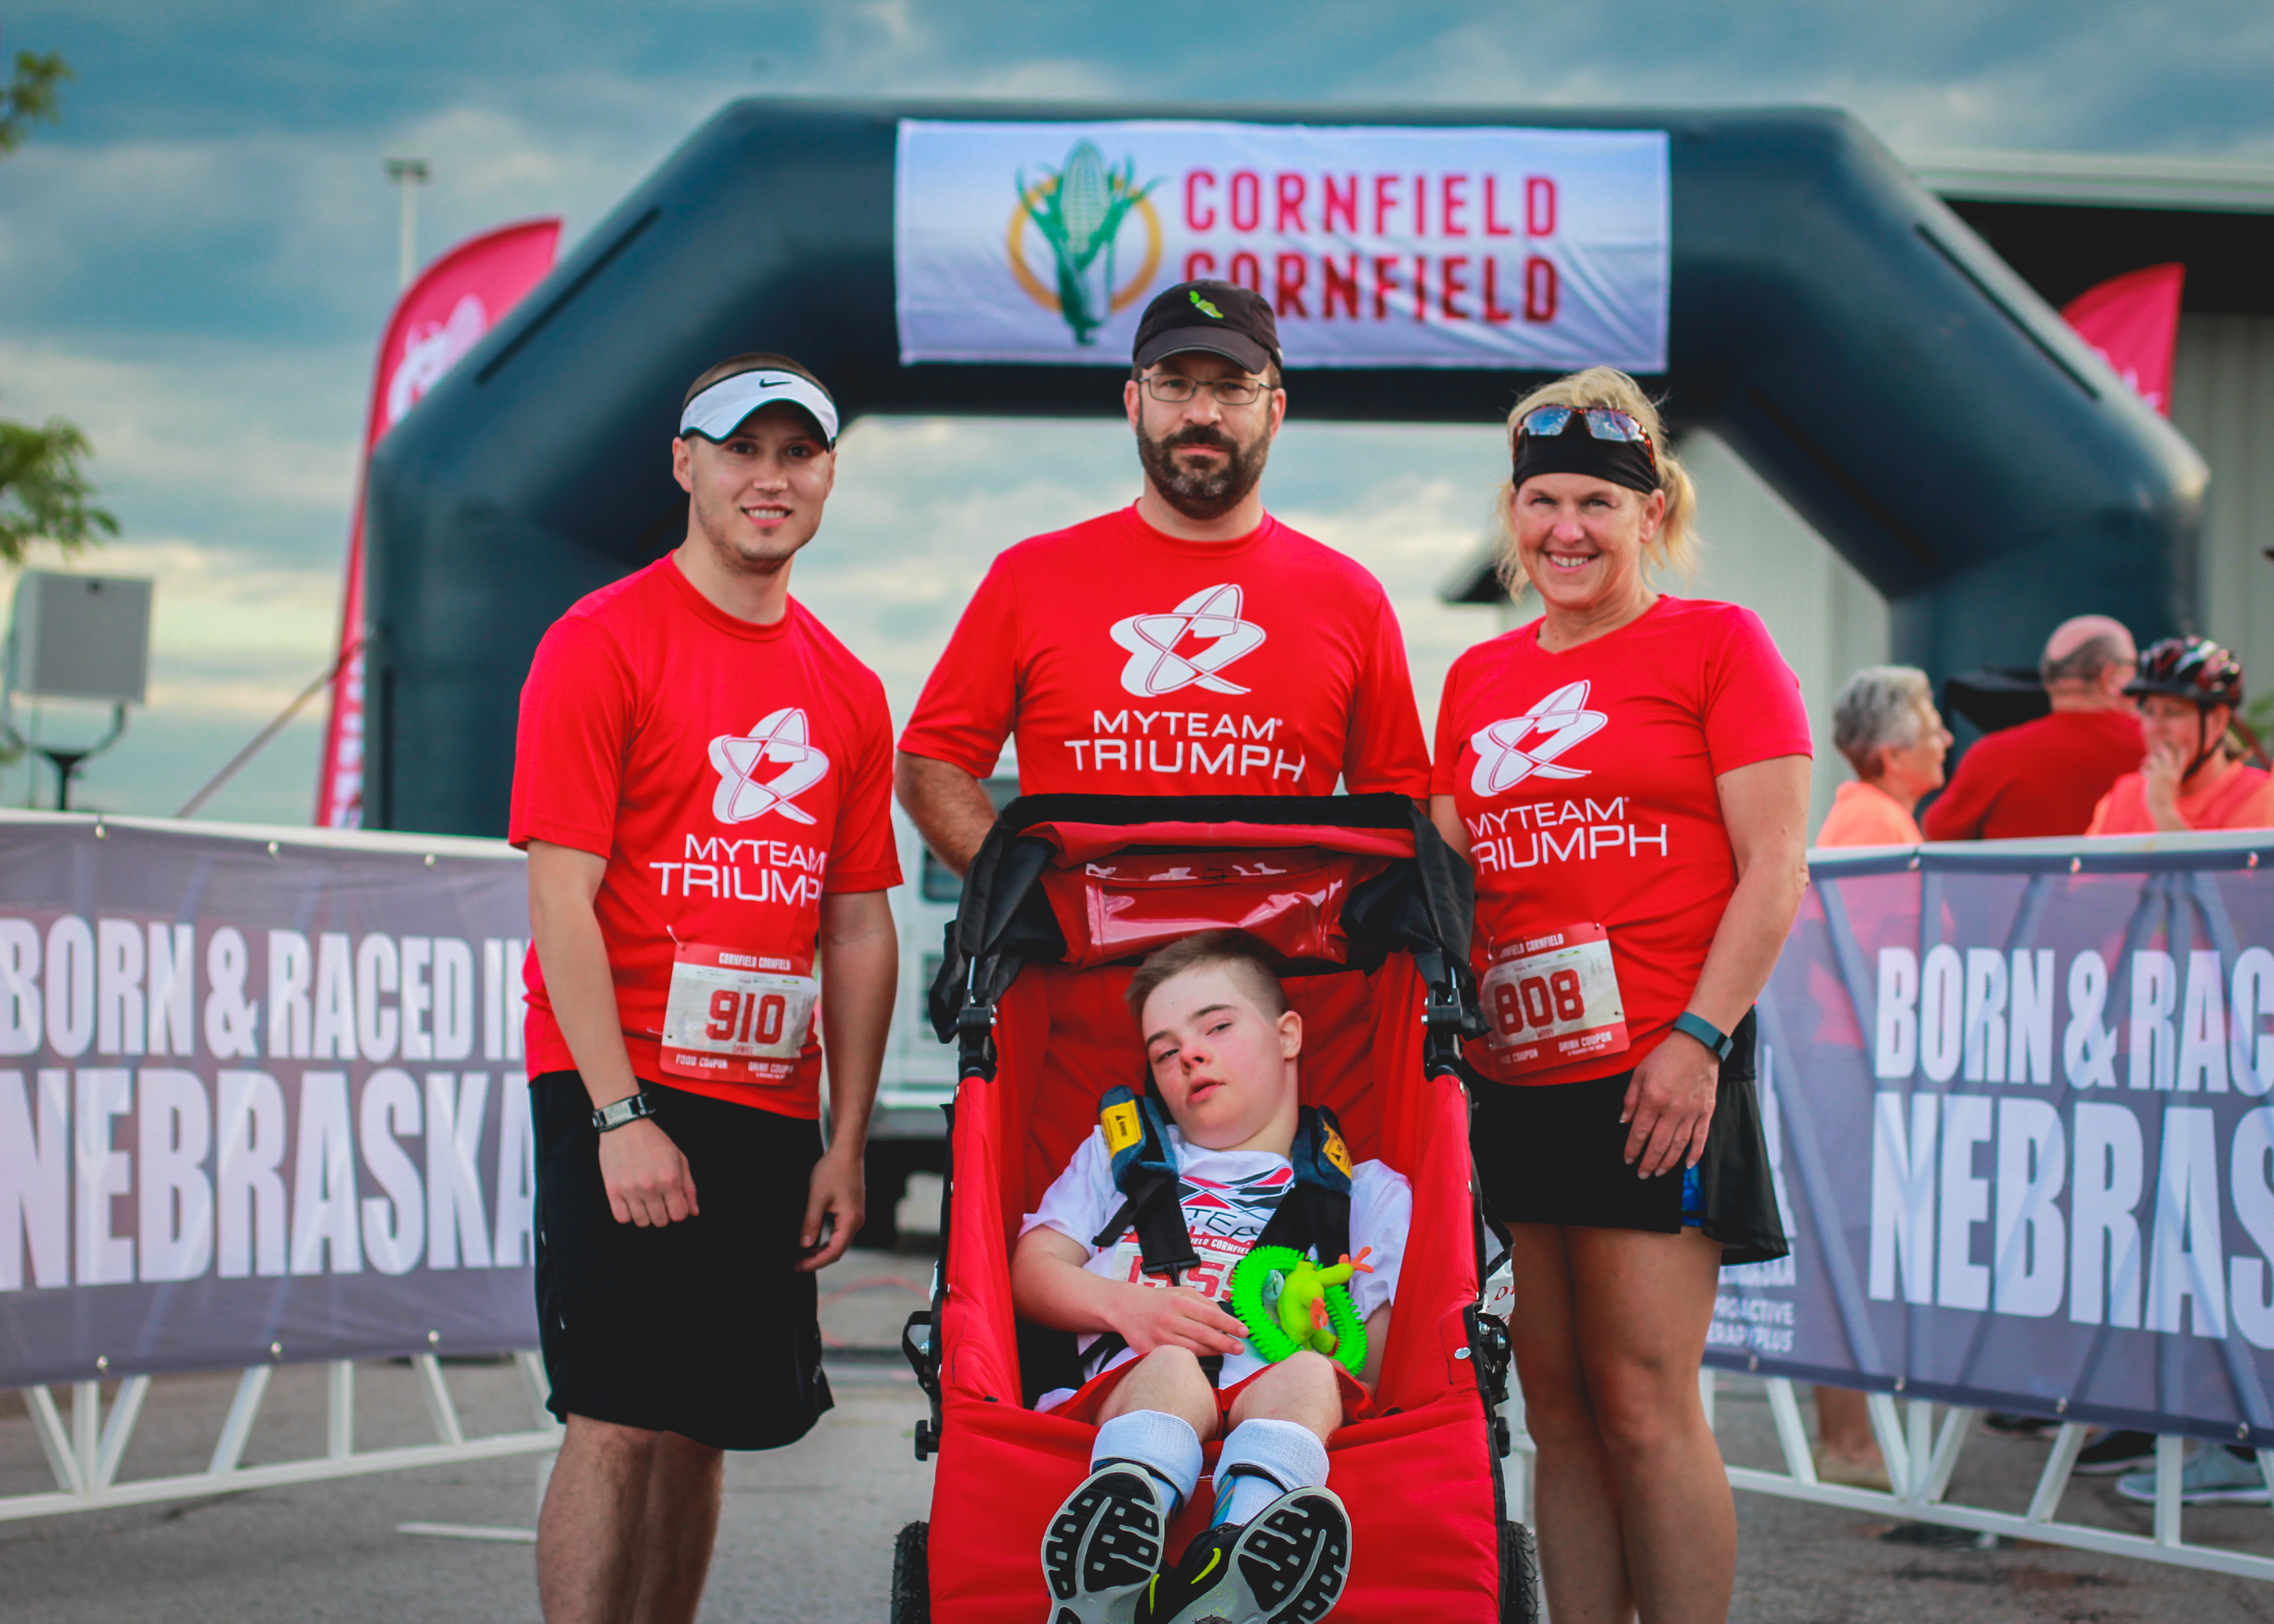 2017 Cornfield Cornfield 10K Spotlight Team: myTEAM TRIUMPH